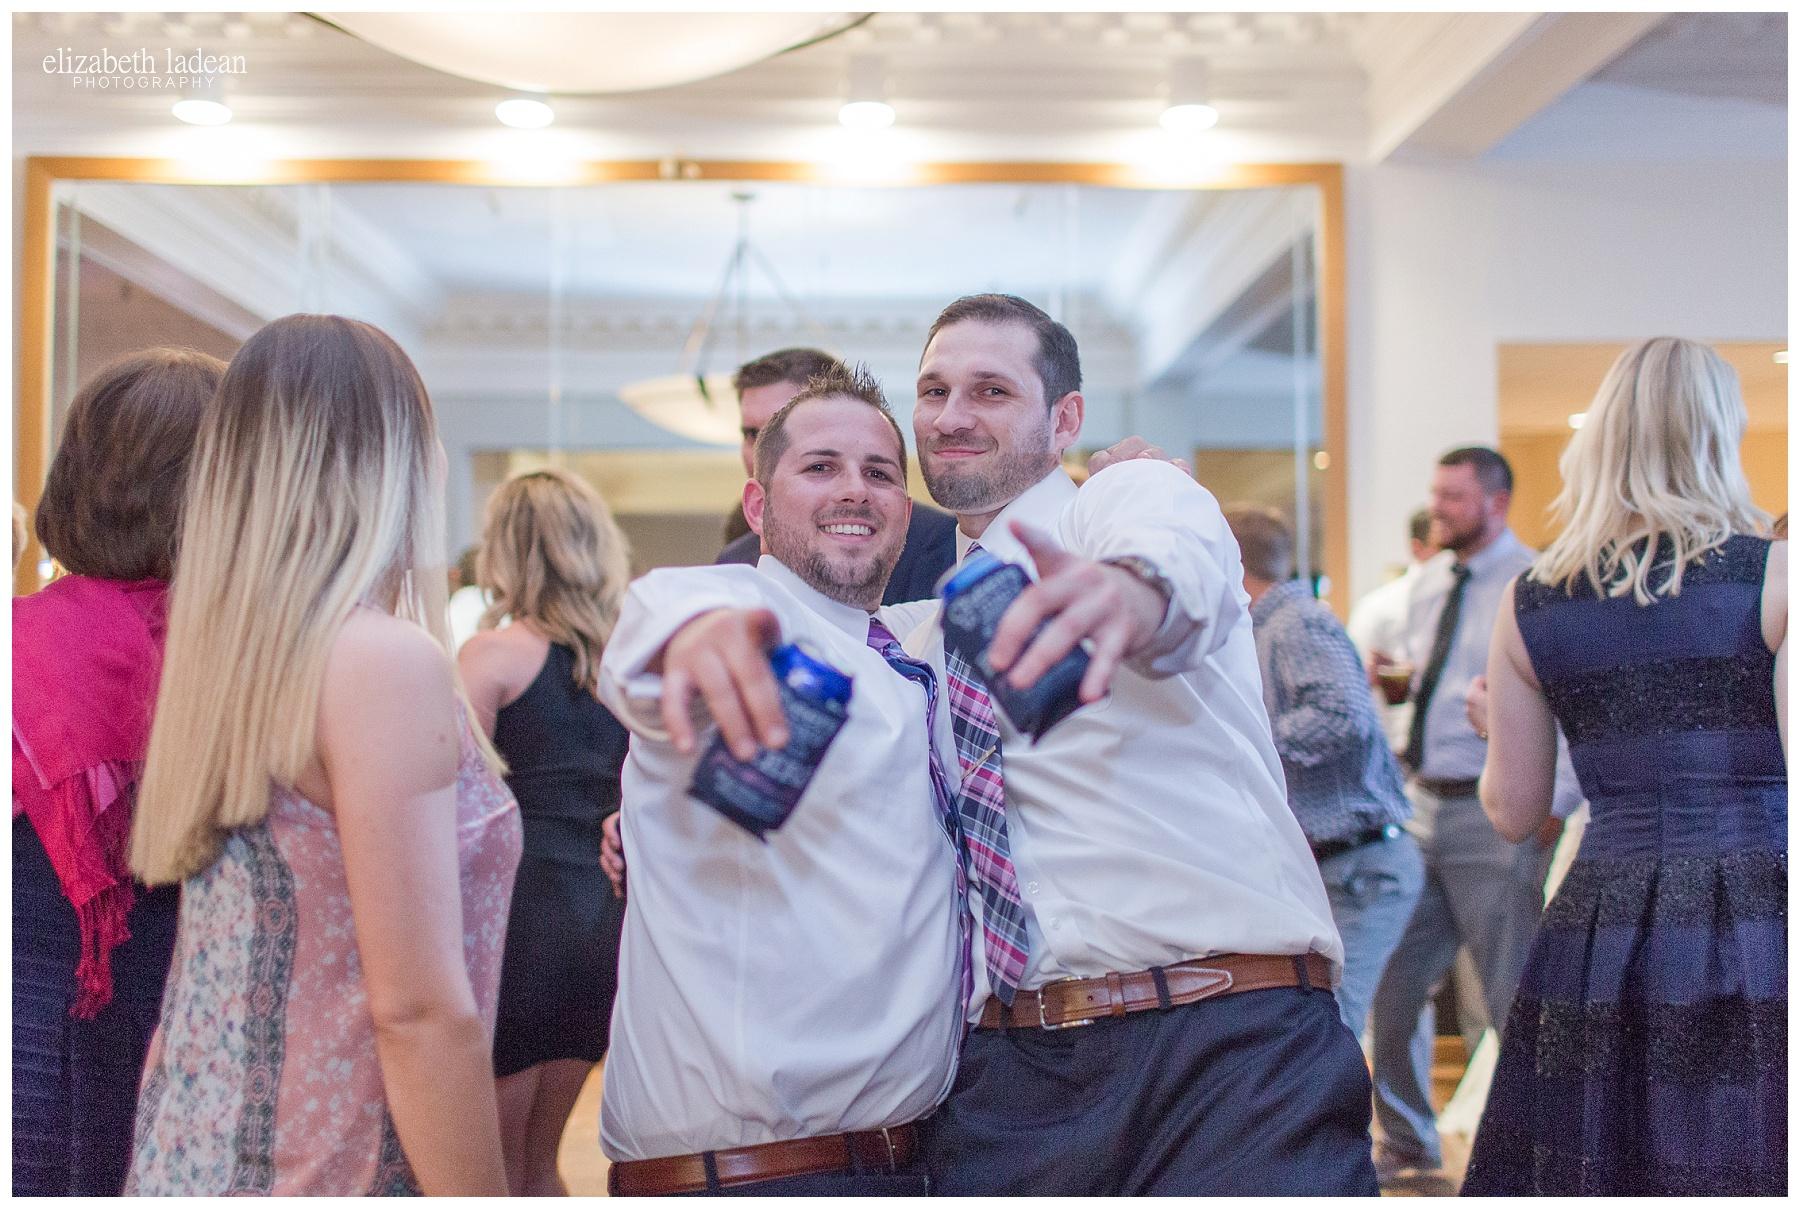 Hillcrest-Country-Club-Kansas-City-Wedding-Photography-E+J-0520-Elizabeth-Ladean-Photography-photo_0893.jpg